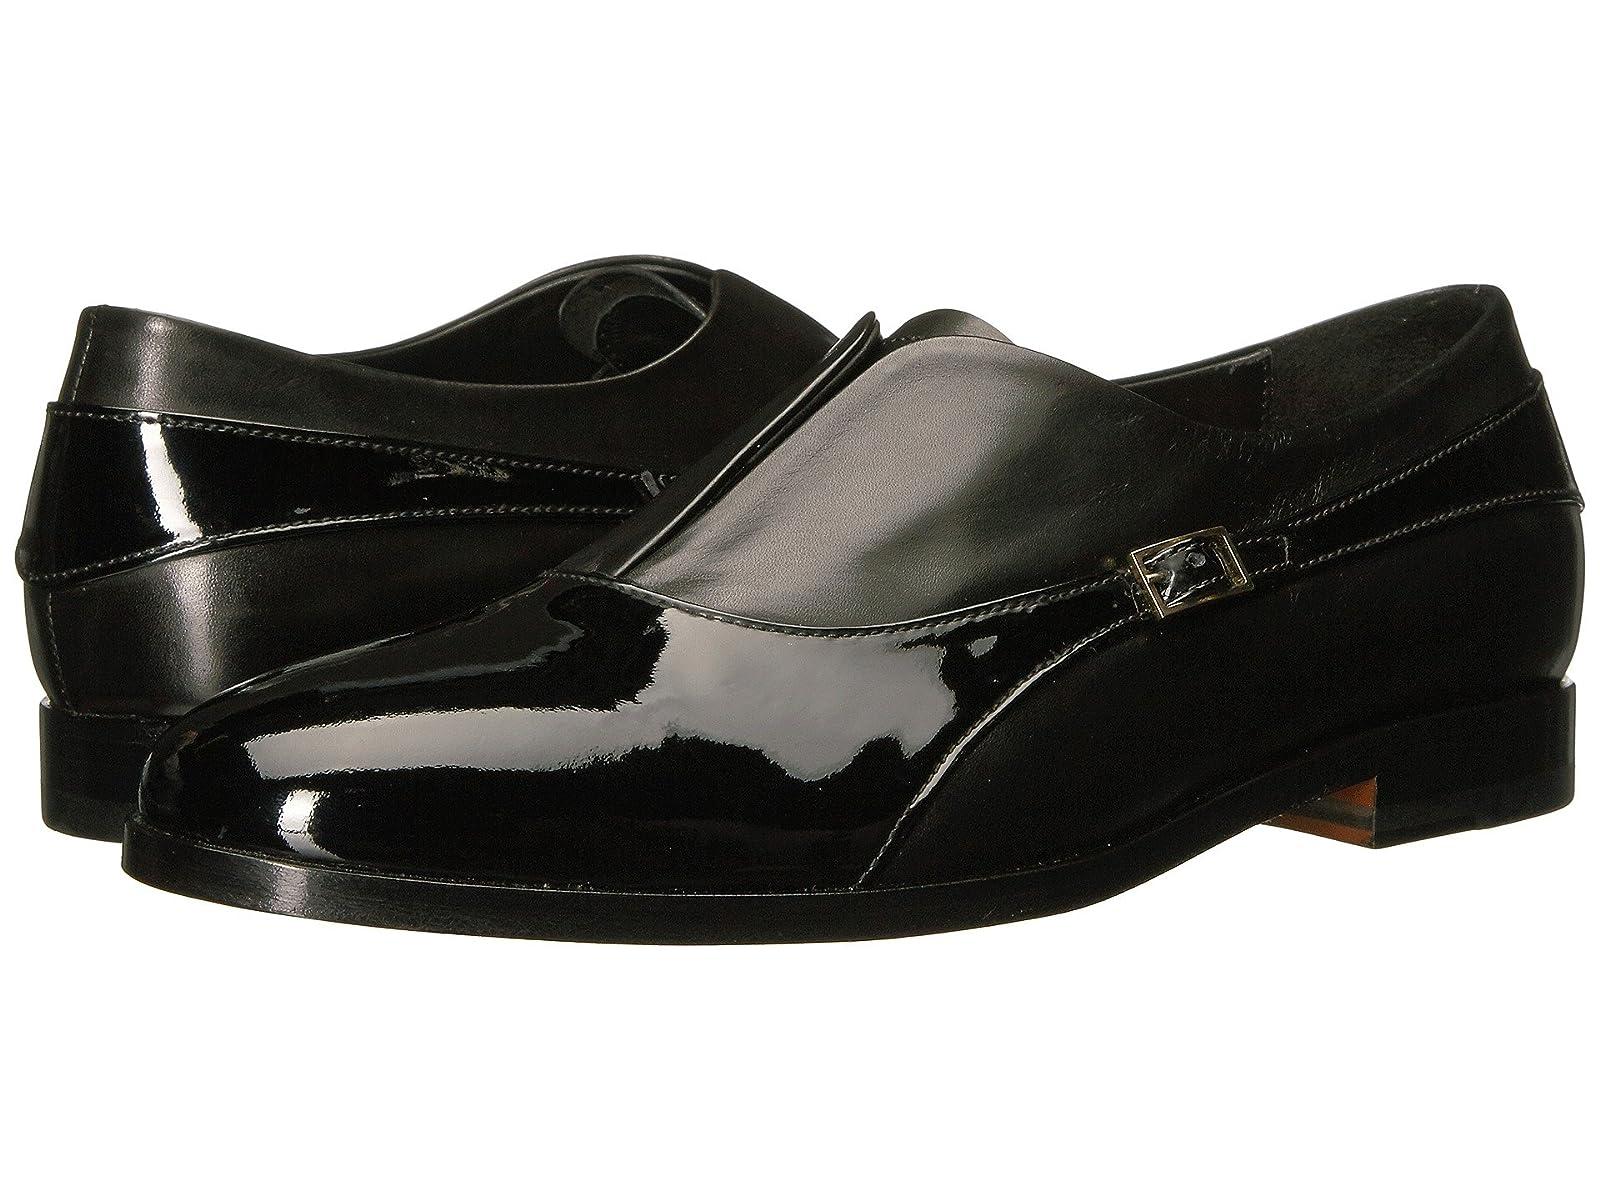 Rupert Sanderson JebCheap and distinctive eye-catching shoes